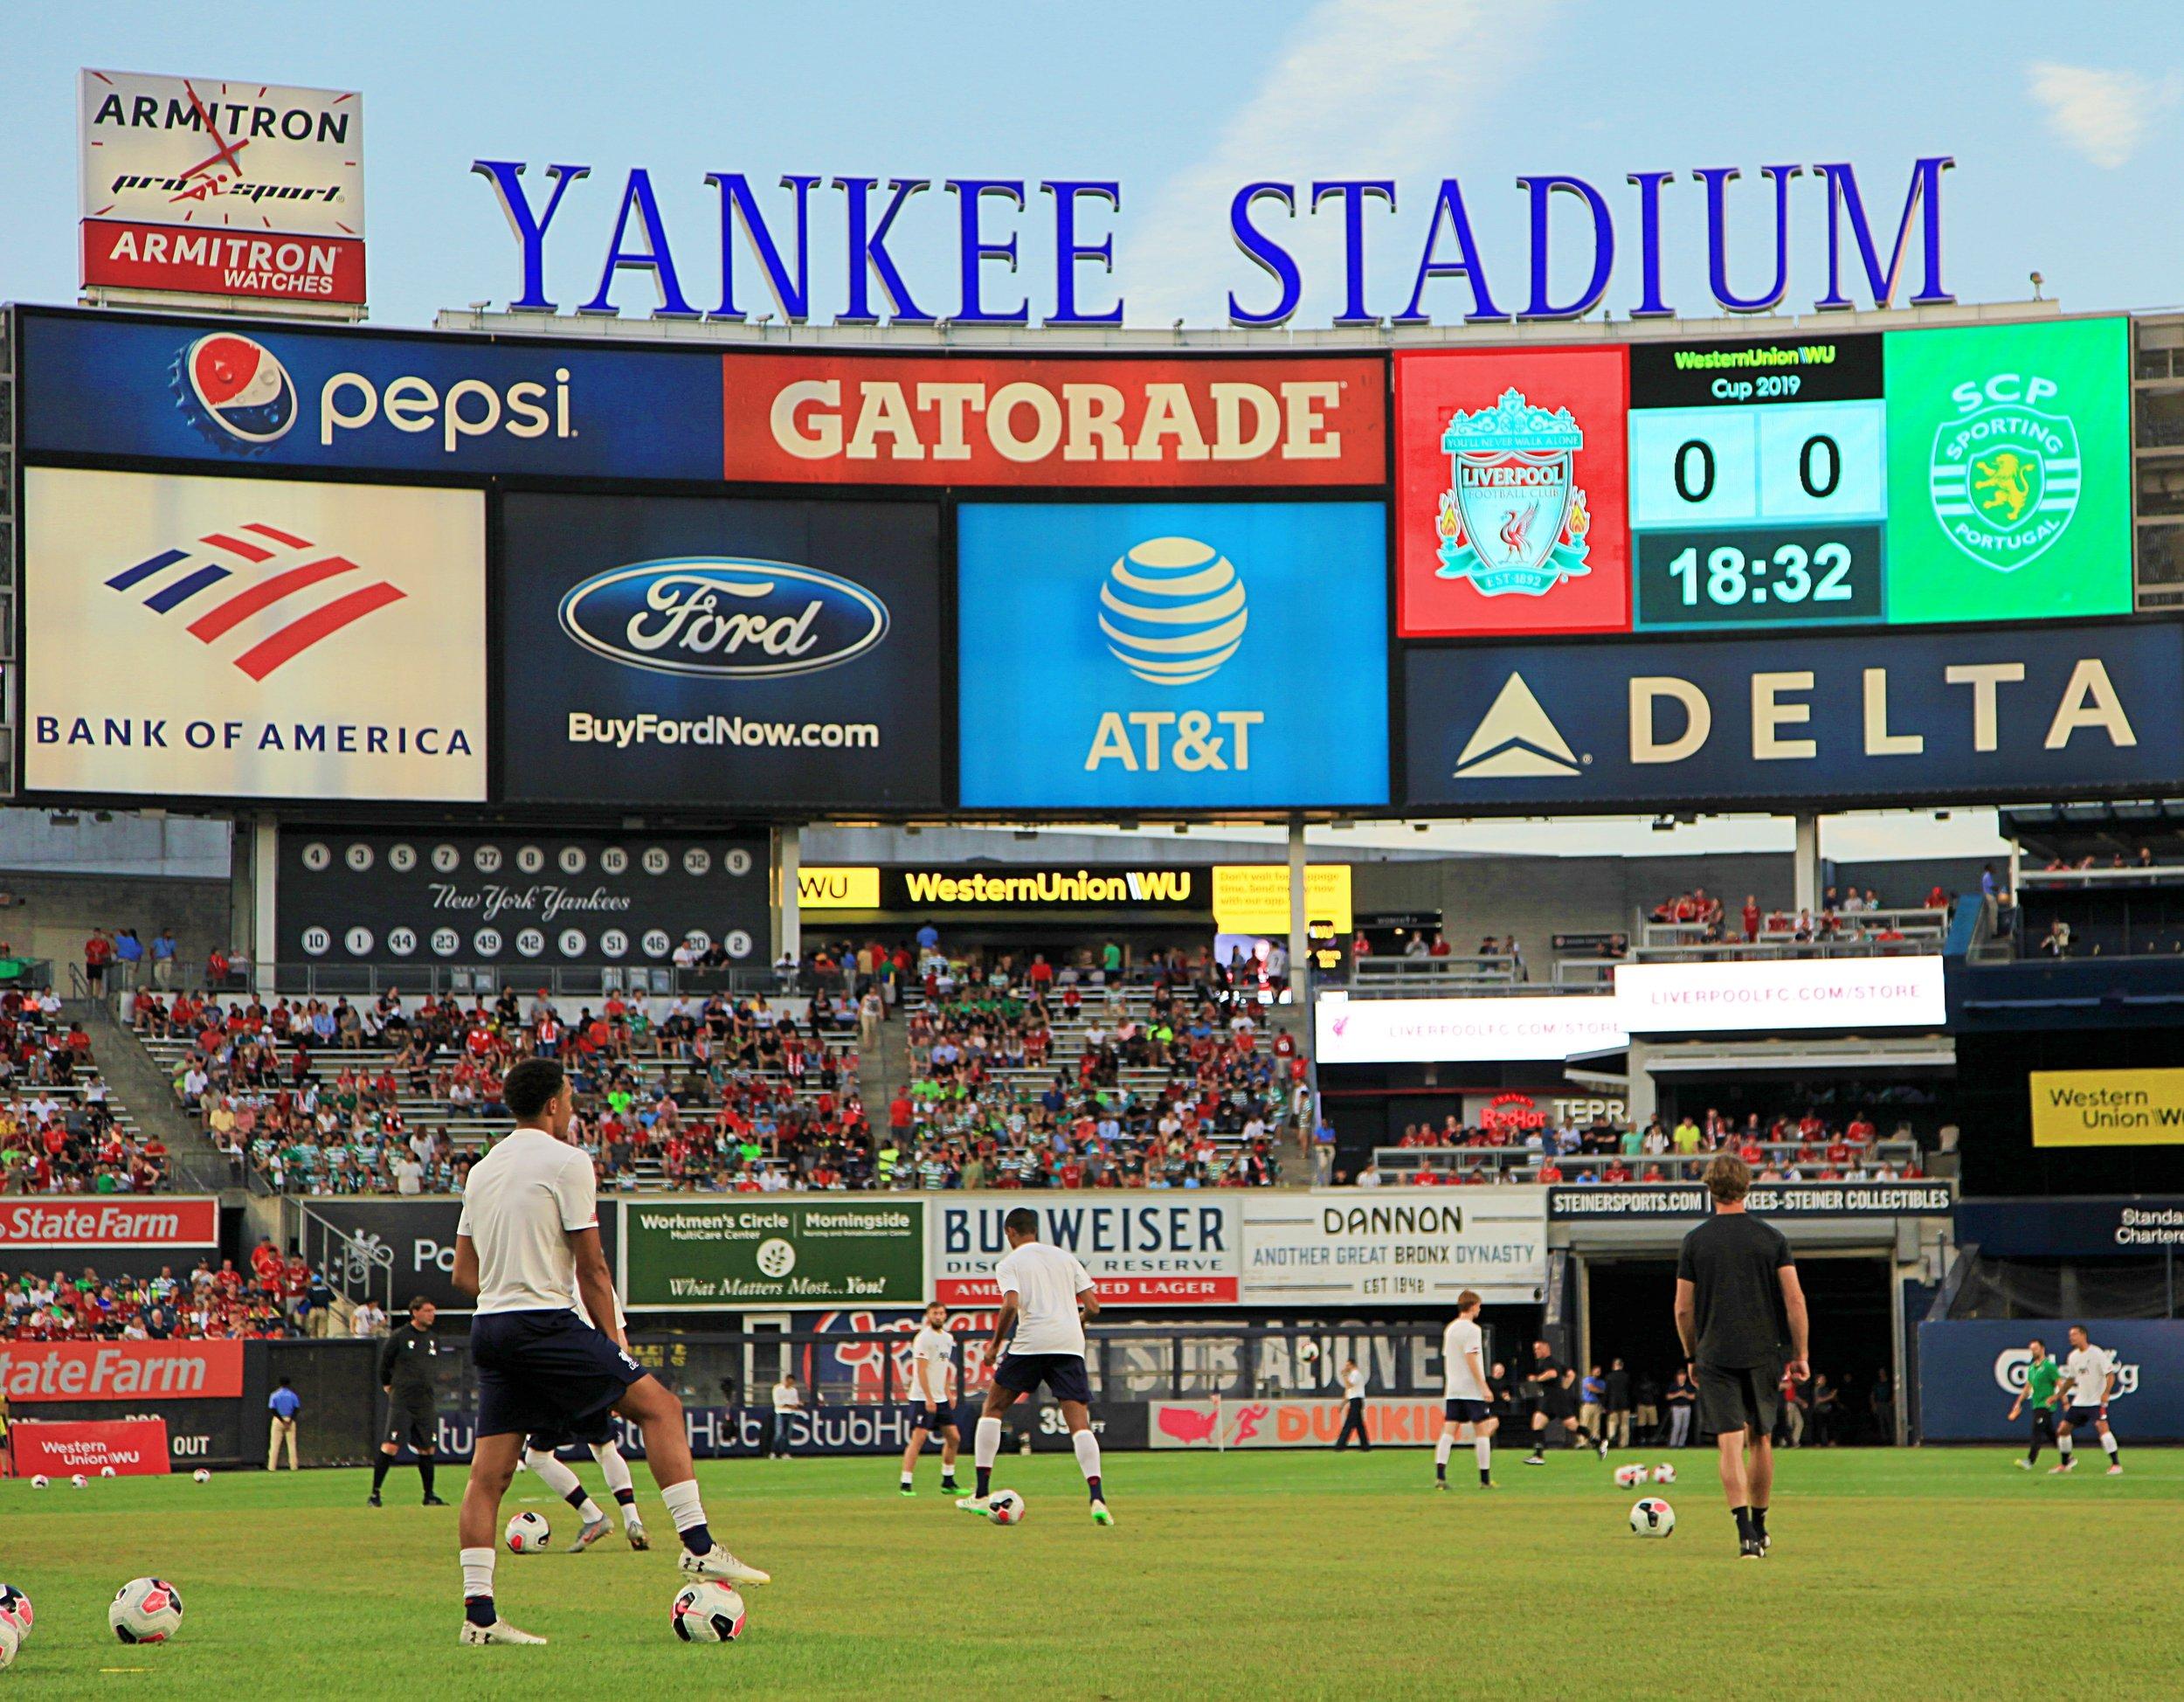 Yankee Stadium warm up.